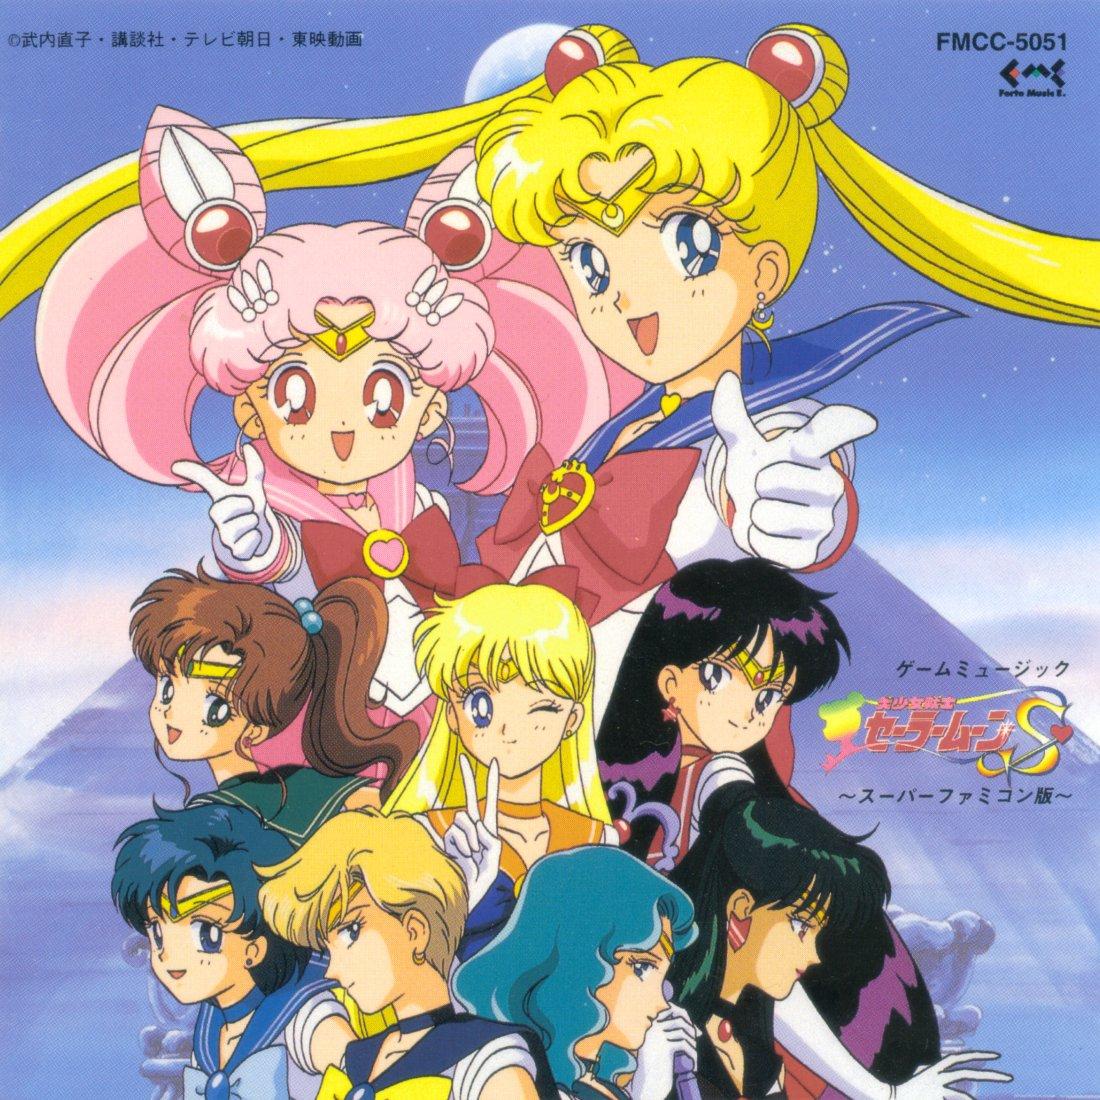 Game Music Sailor Moon S ~ Super Famicom ~